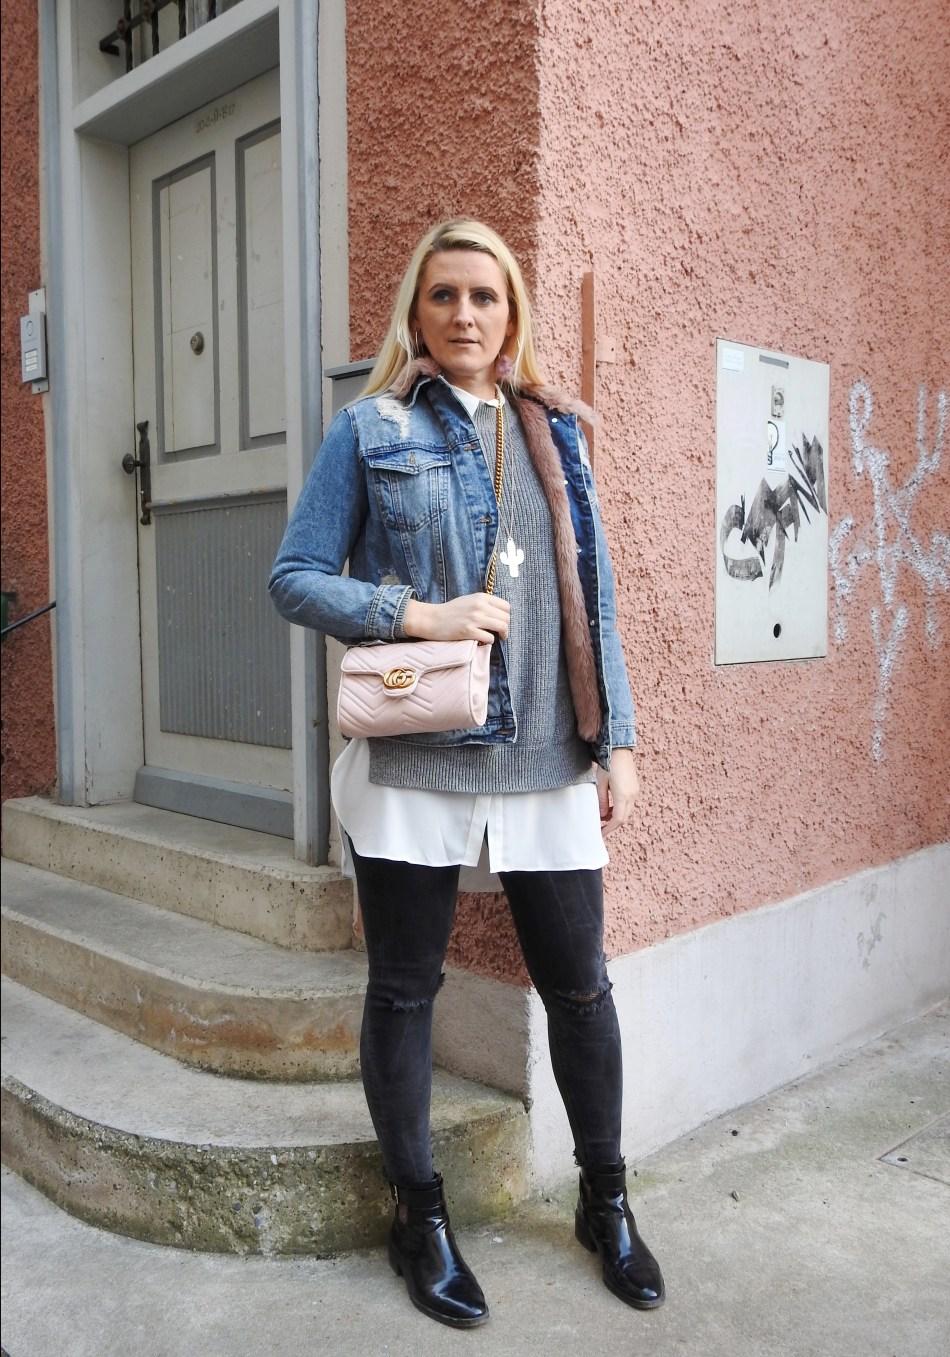 carrieslifestyle-Tamara-Prutsch-Shopaholic-Gucci-Bag-Denim-Boots-Fishnet-Stockings-Fakefur-Jeansjacke-Grey-Sweater